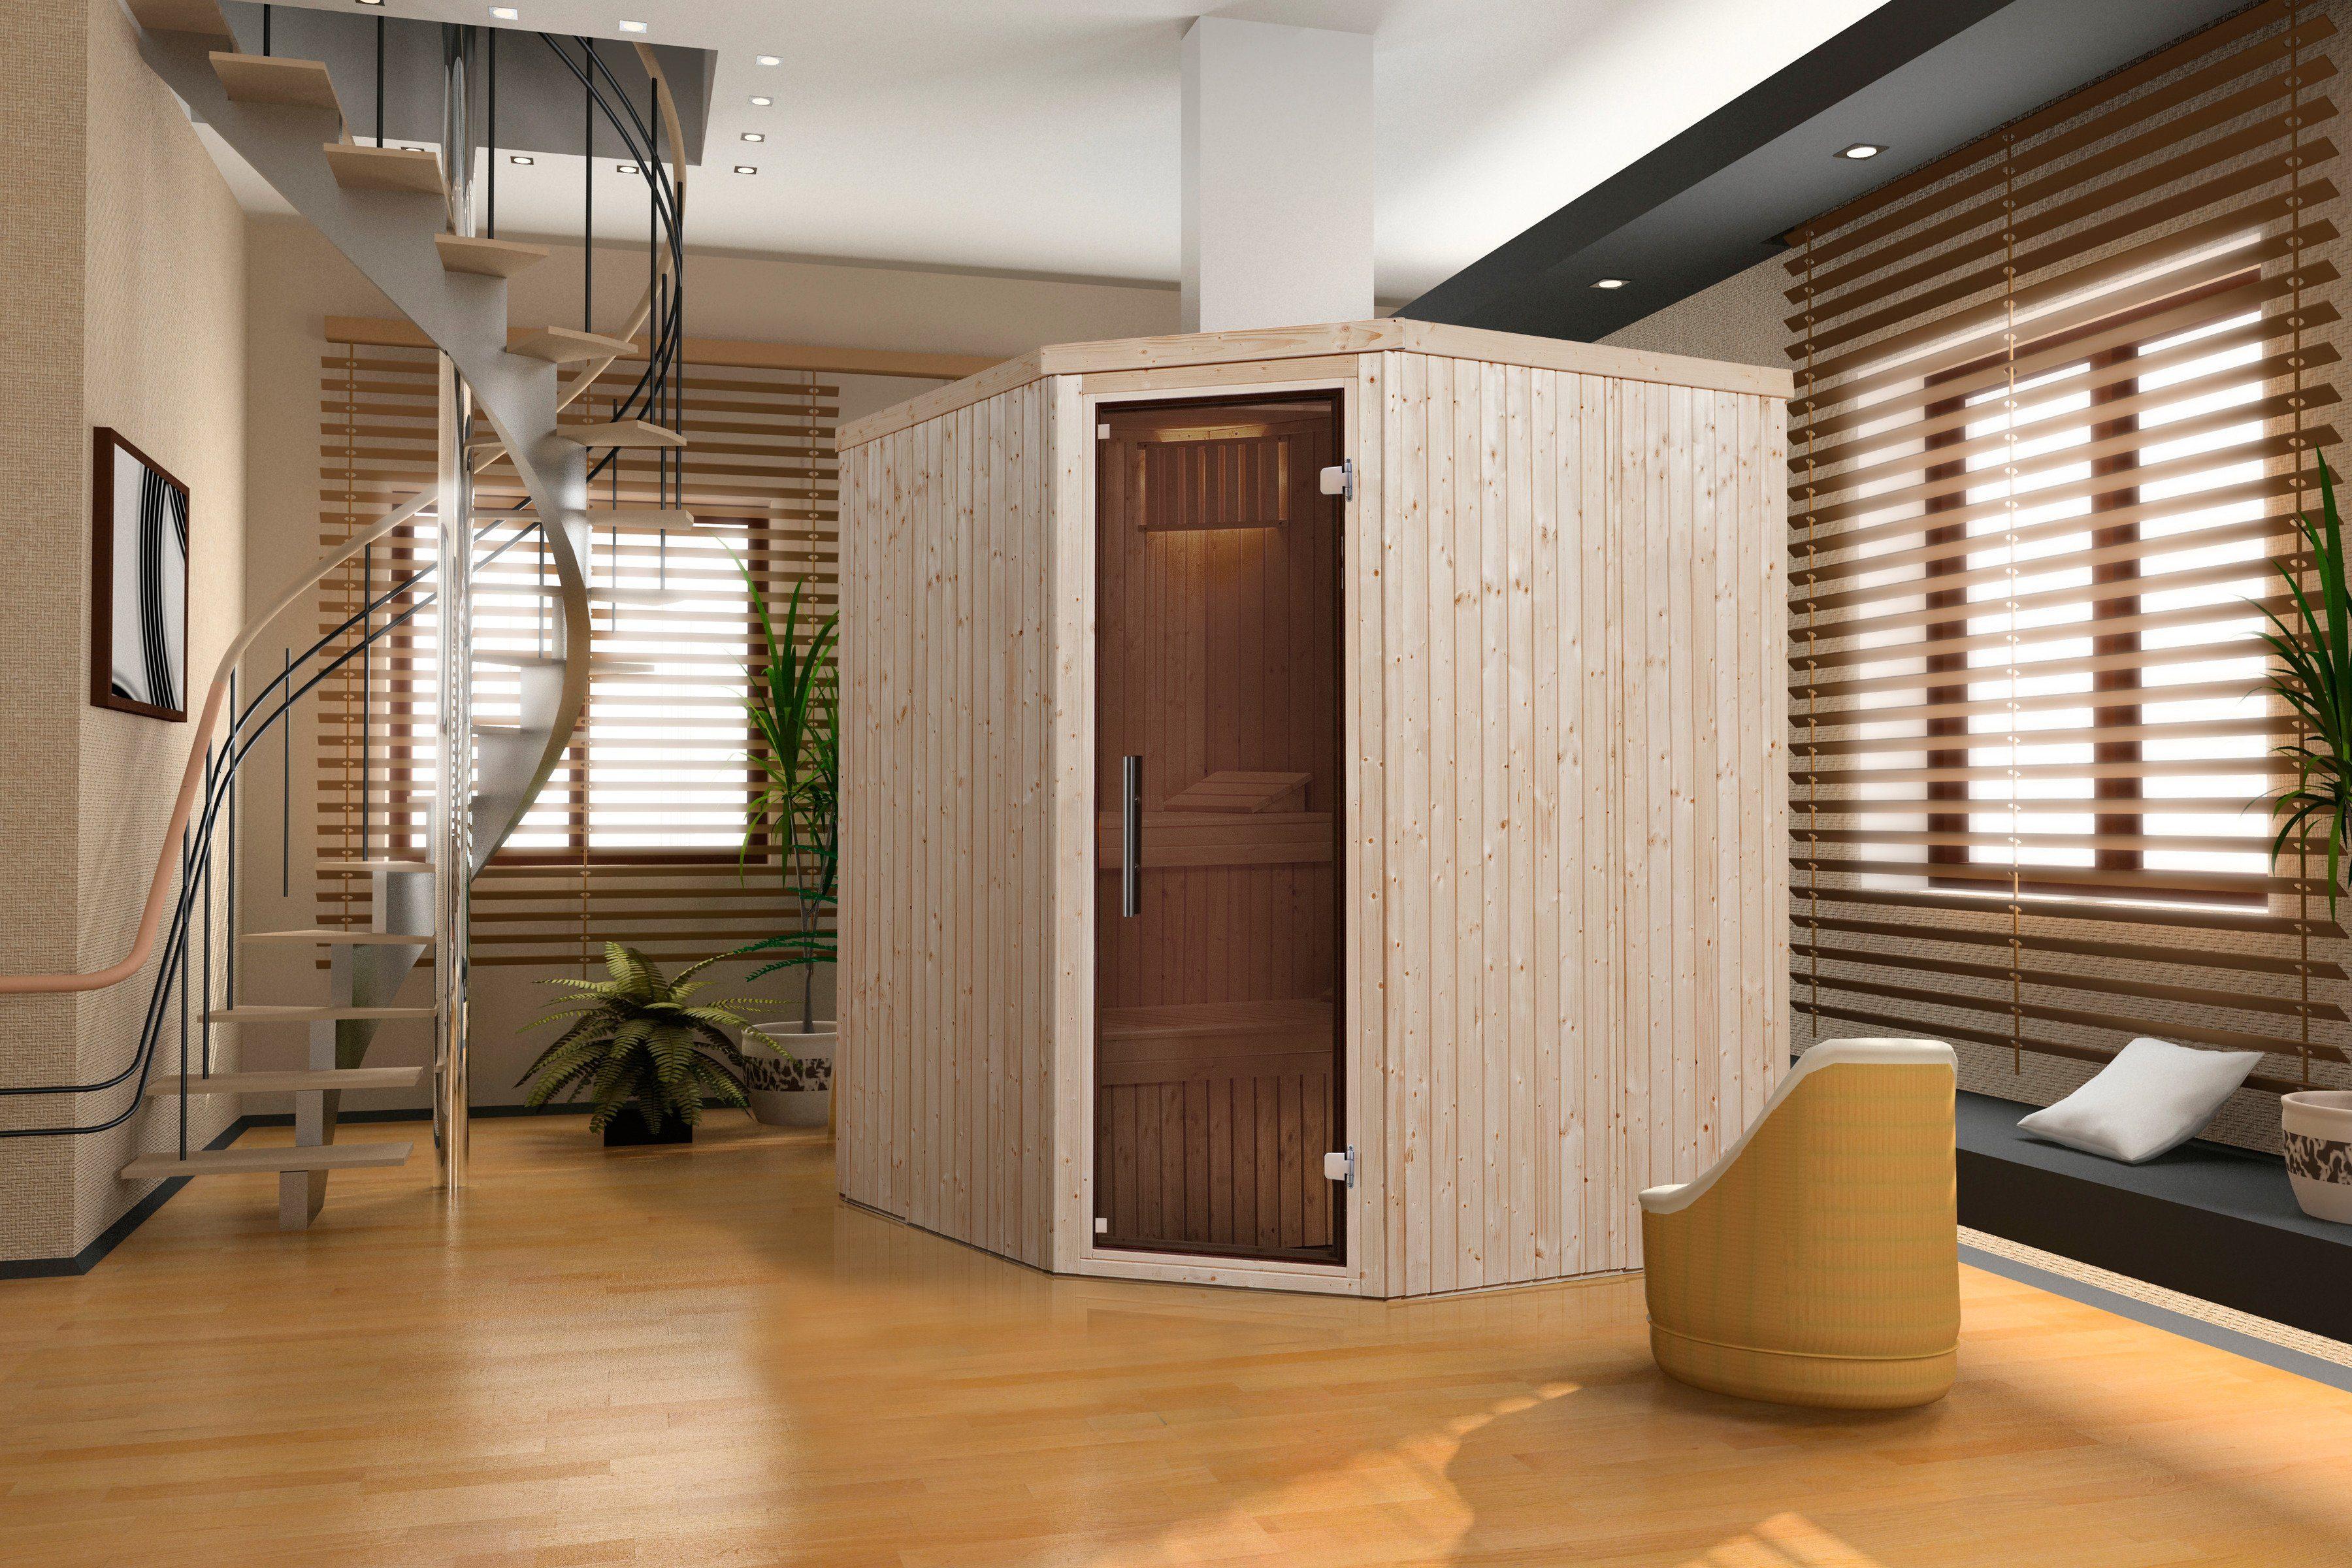 Weka Sauna »Lyngdal 3 Trend Kompakt«, 192/175/199 cm, 68 mm, 8-KW-Ofen